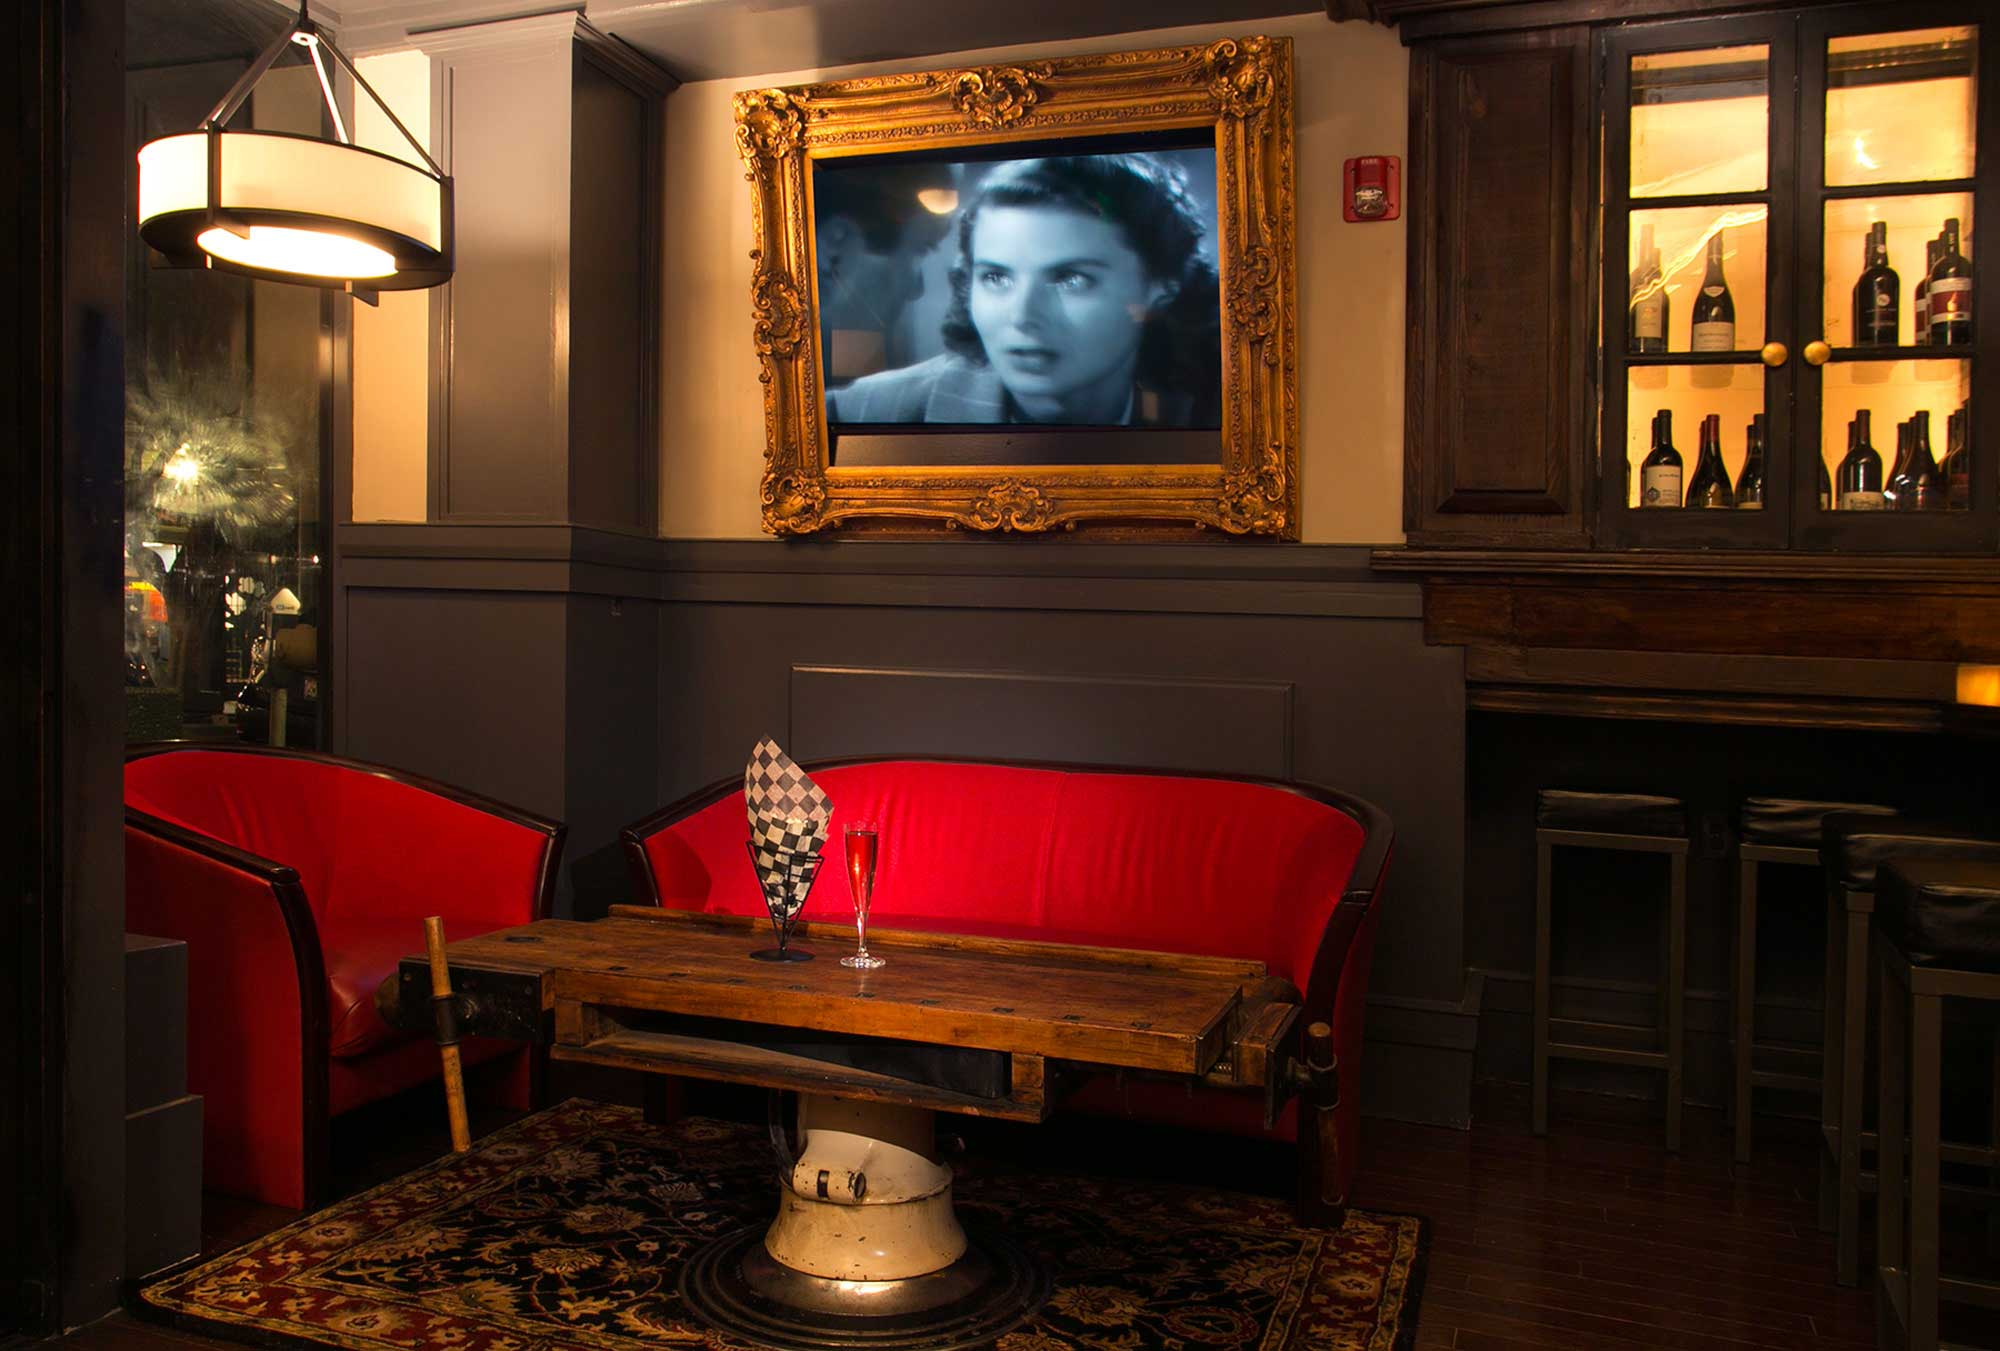 Noir Lounge Announces September Film Screening Schedule